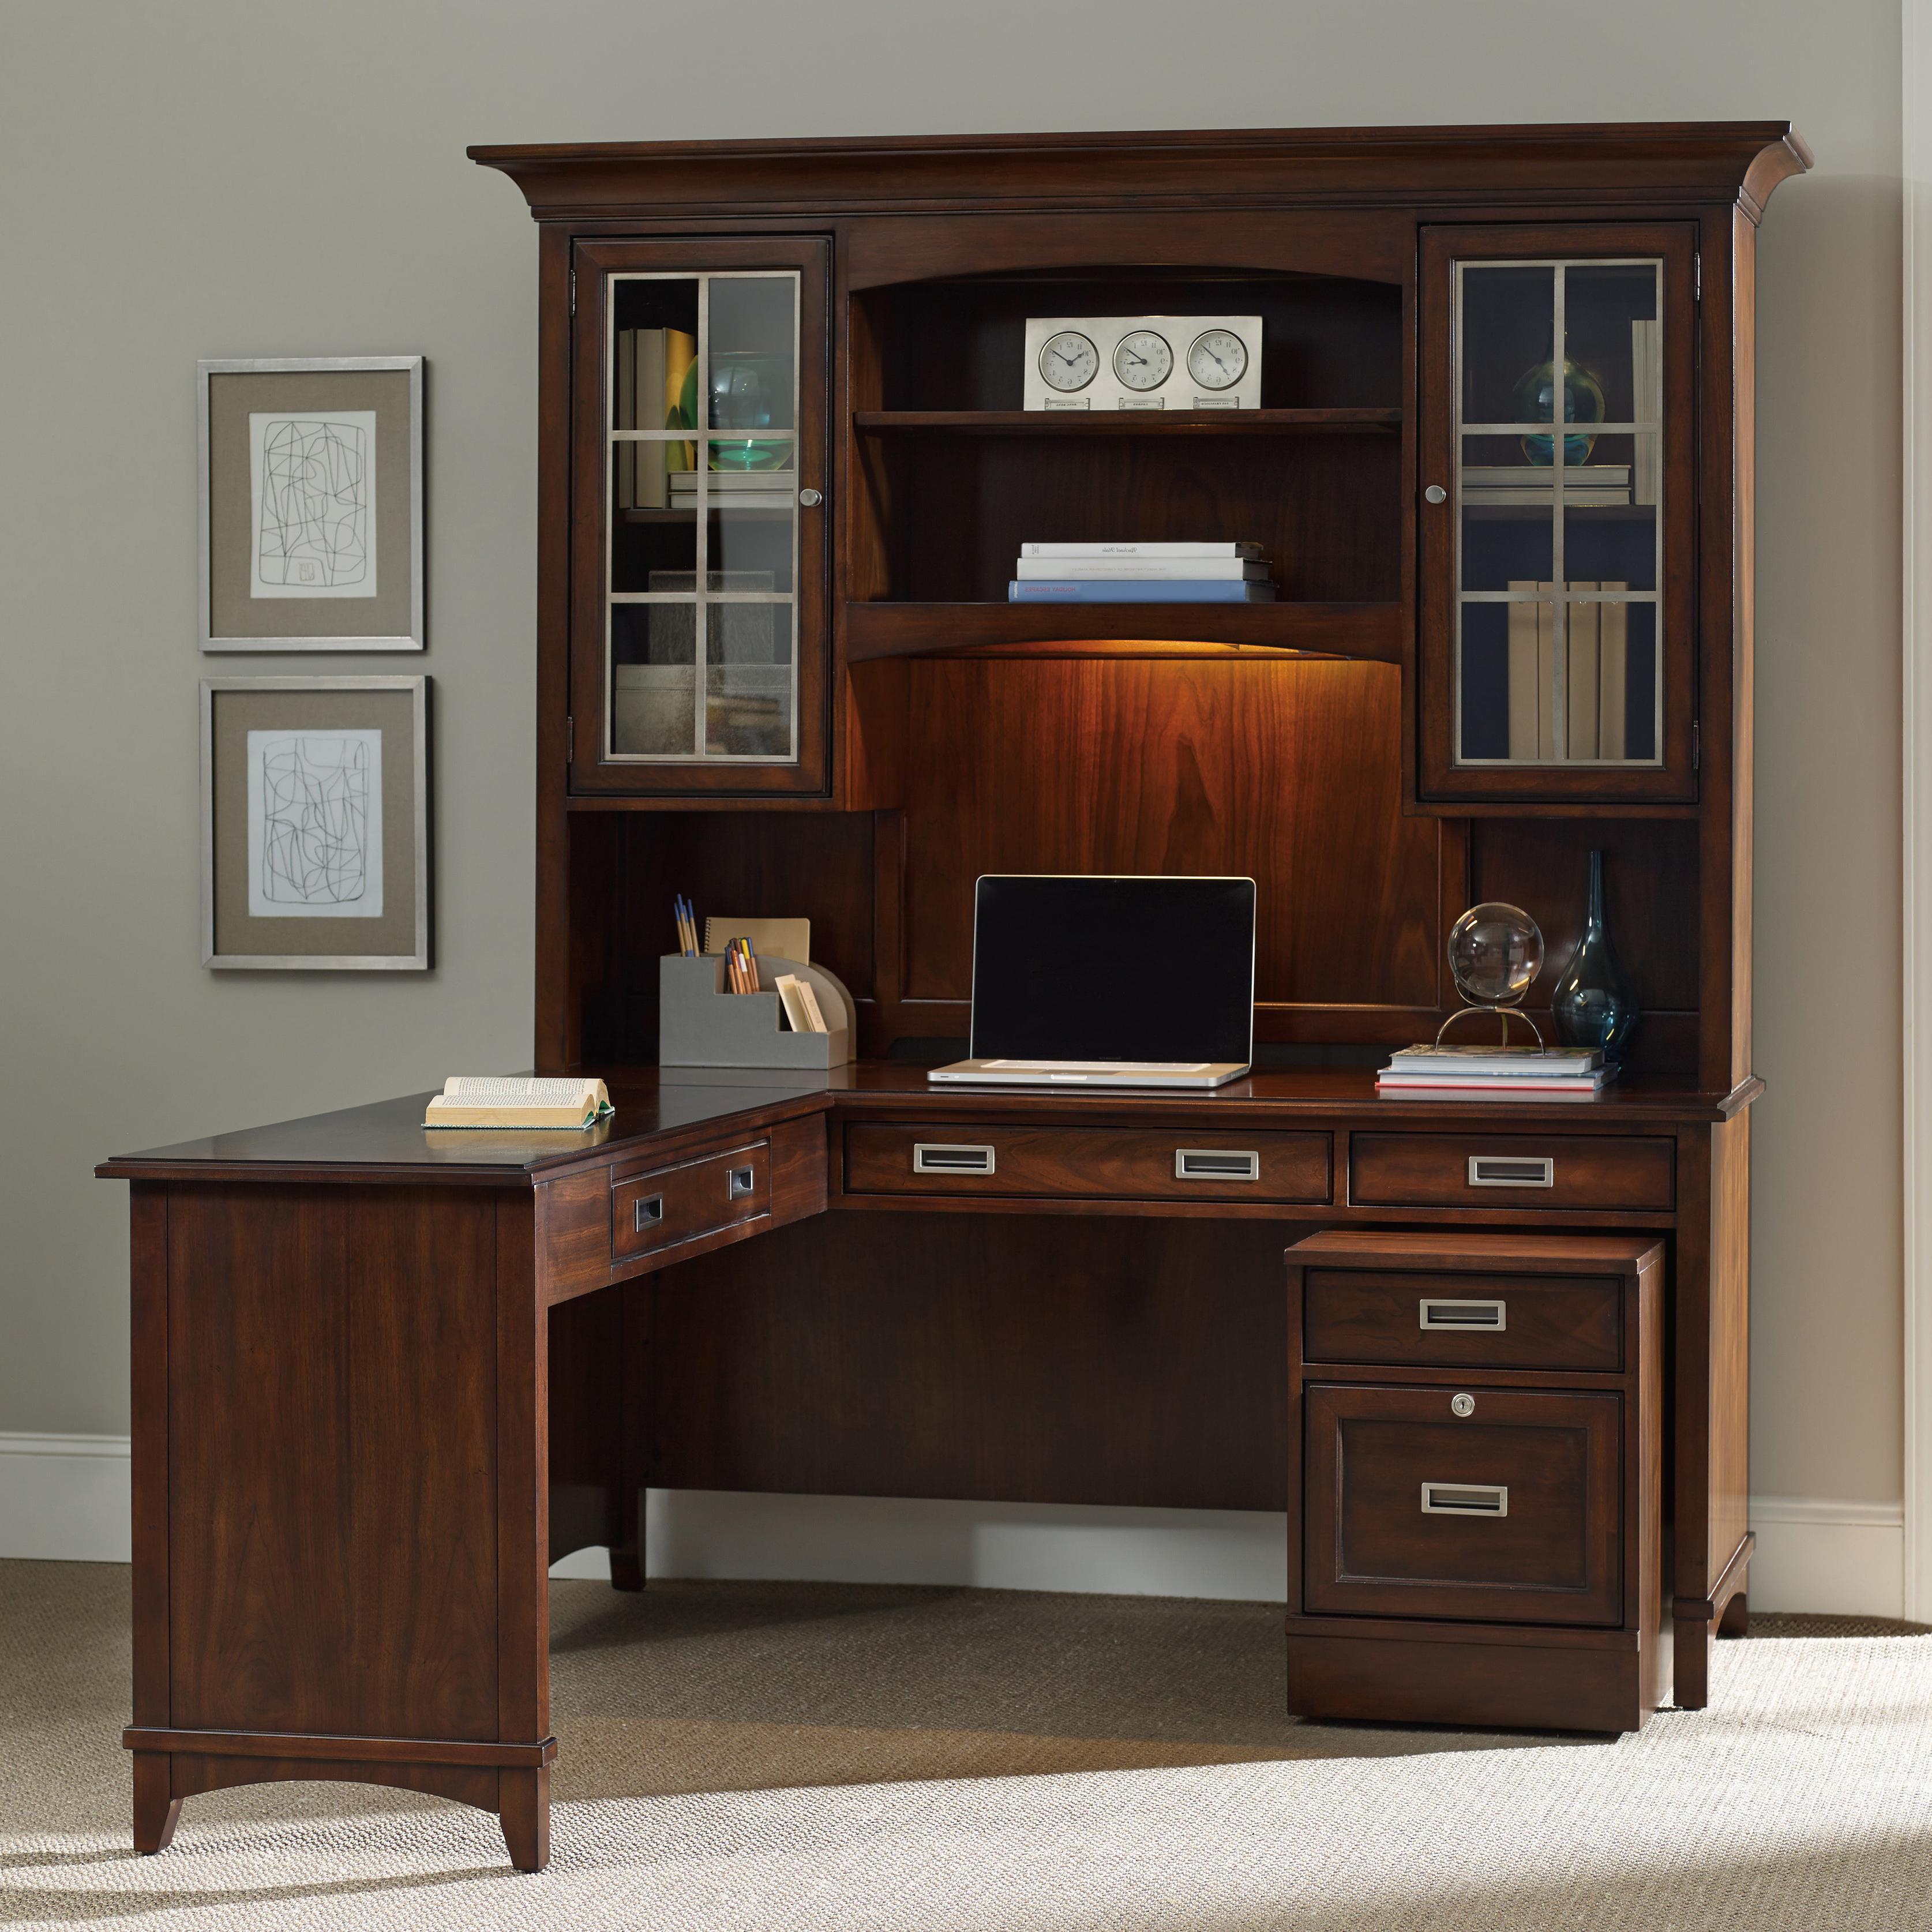 Hooker furniture latitude walnut l shaped desk and hutch for S shaped office desk